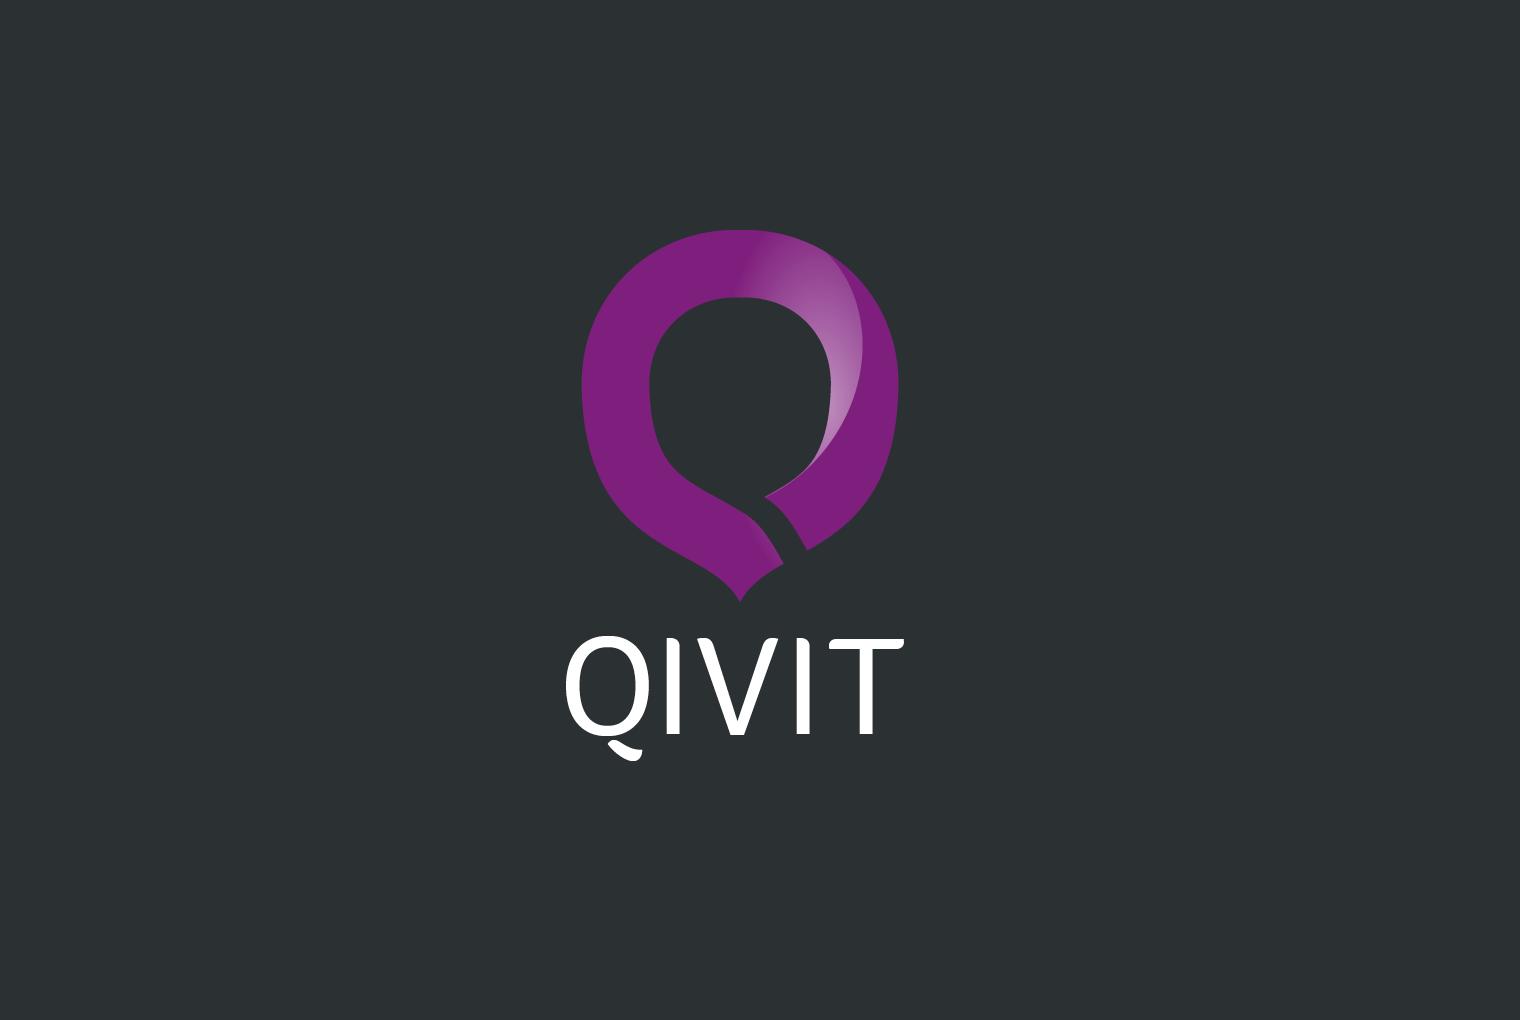 Logos_07_Qivit